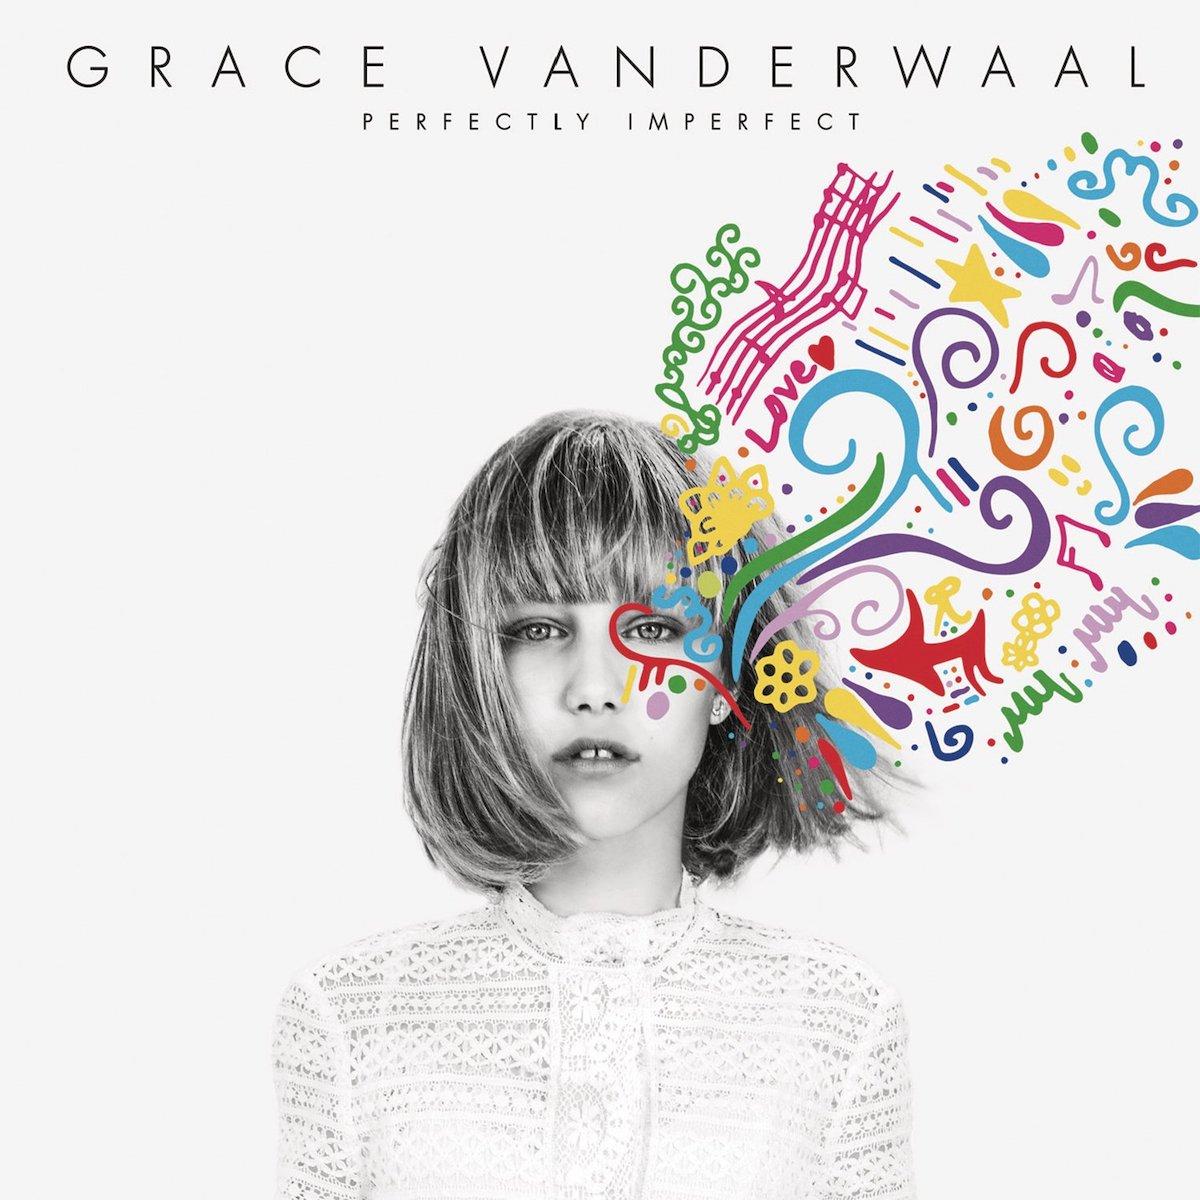 perfectly imperfect grace vanderwaal